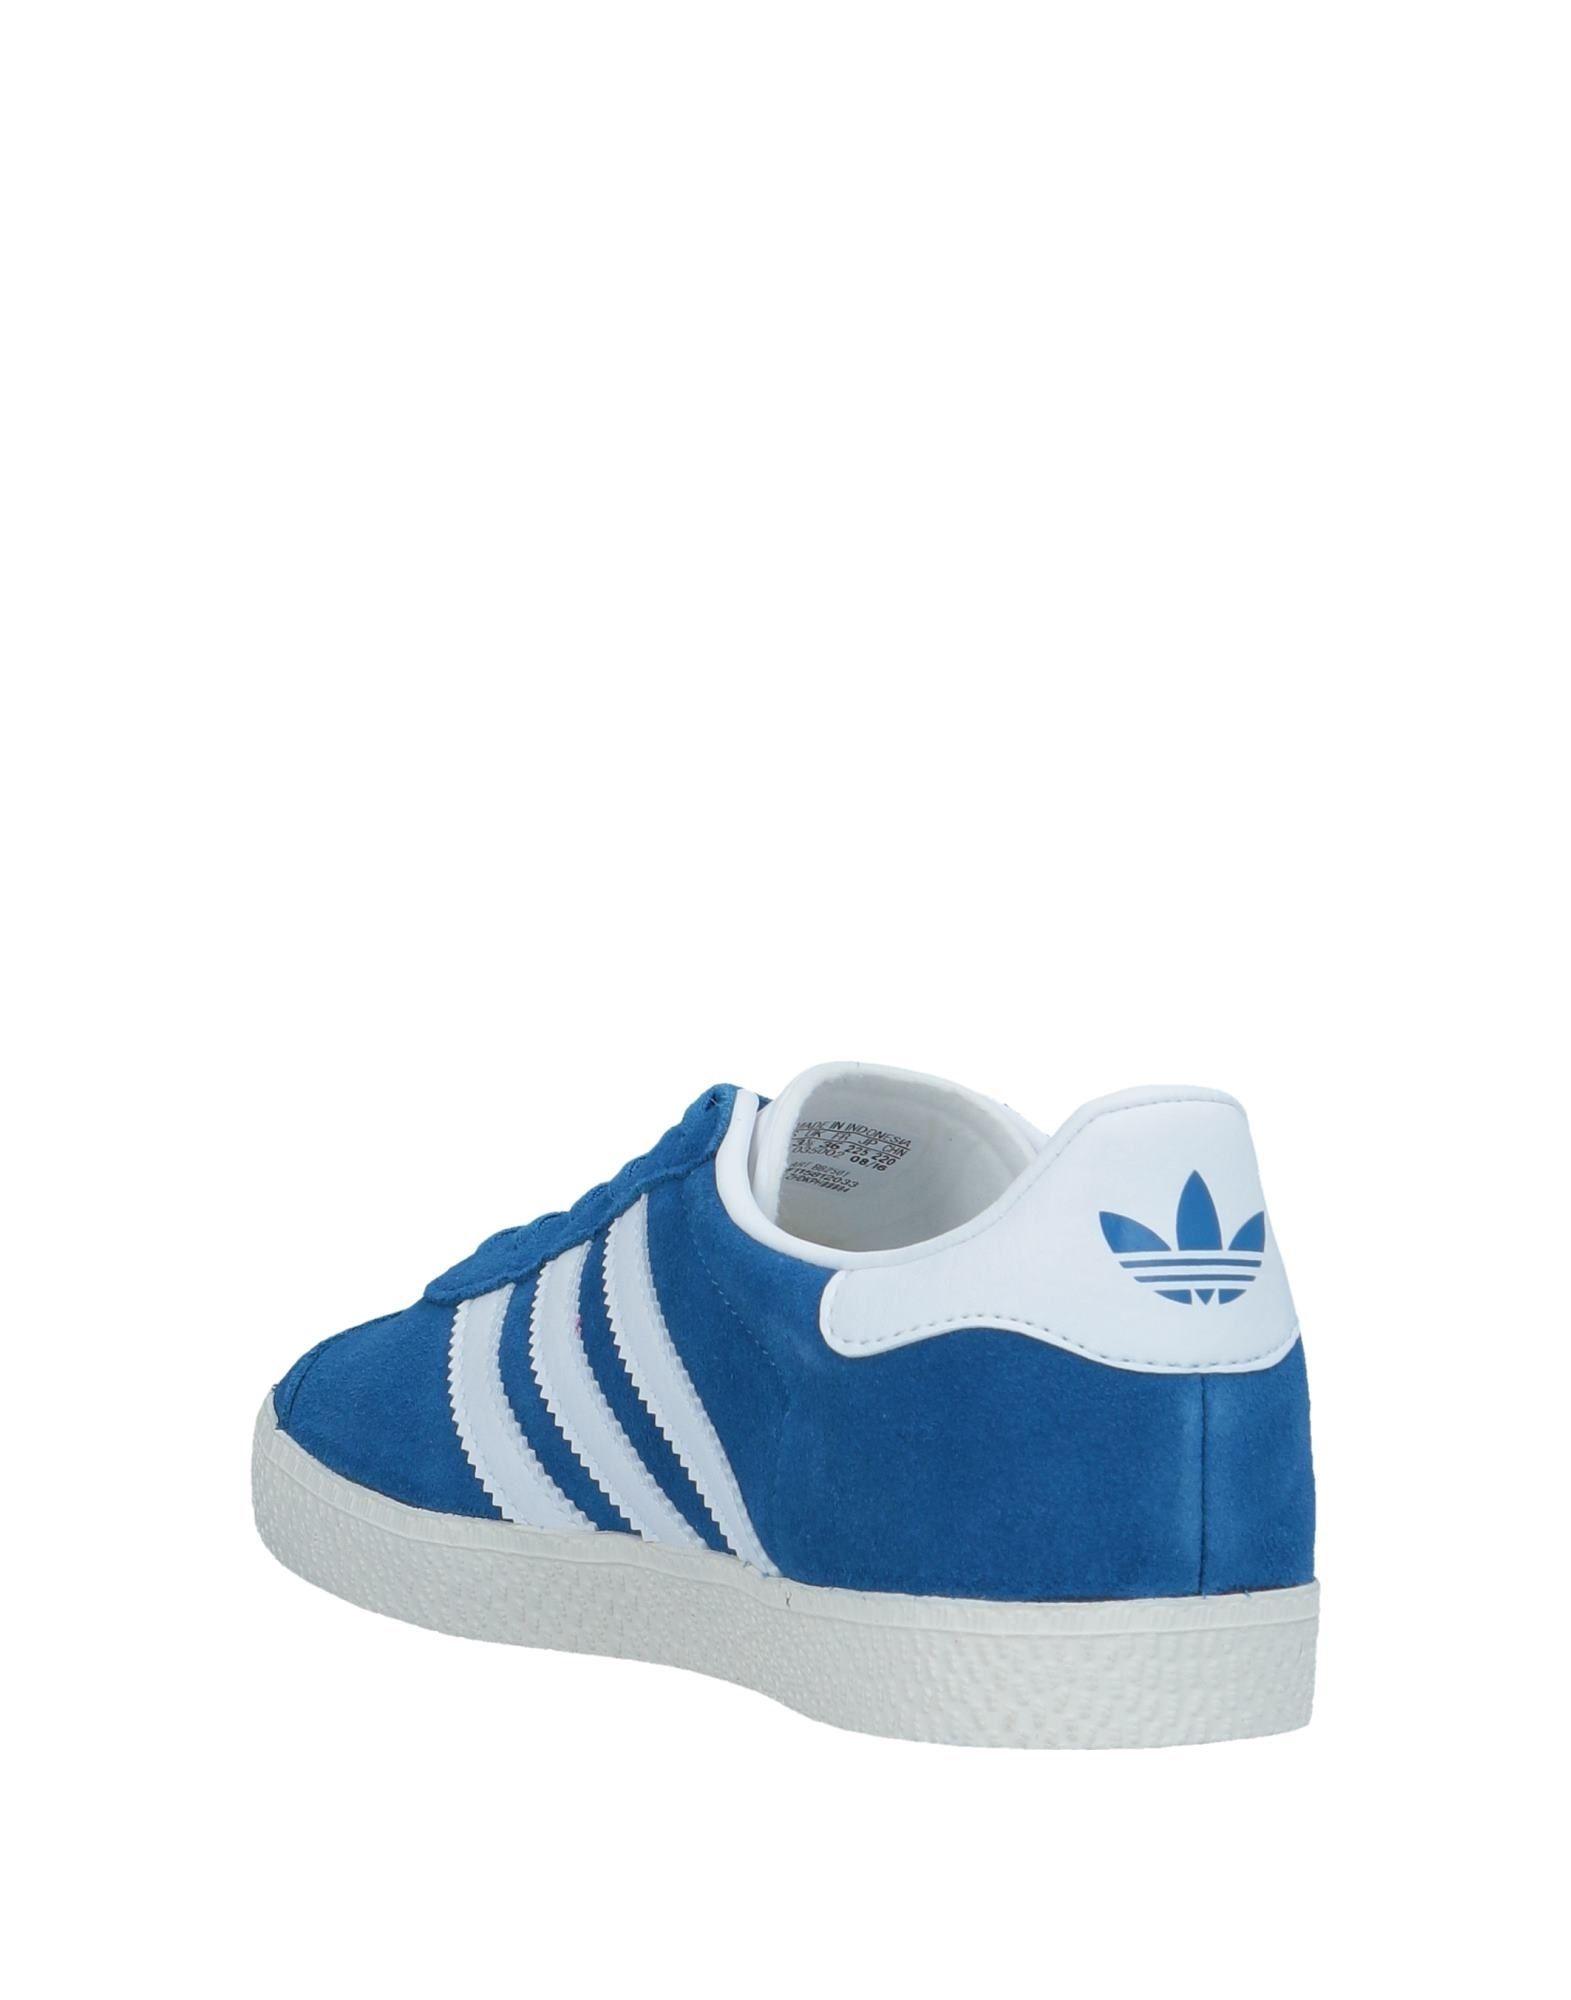 Adidas Originals Blue Leather Sneakers